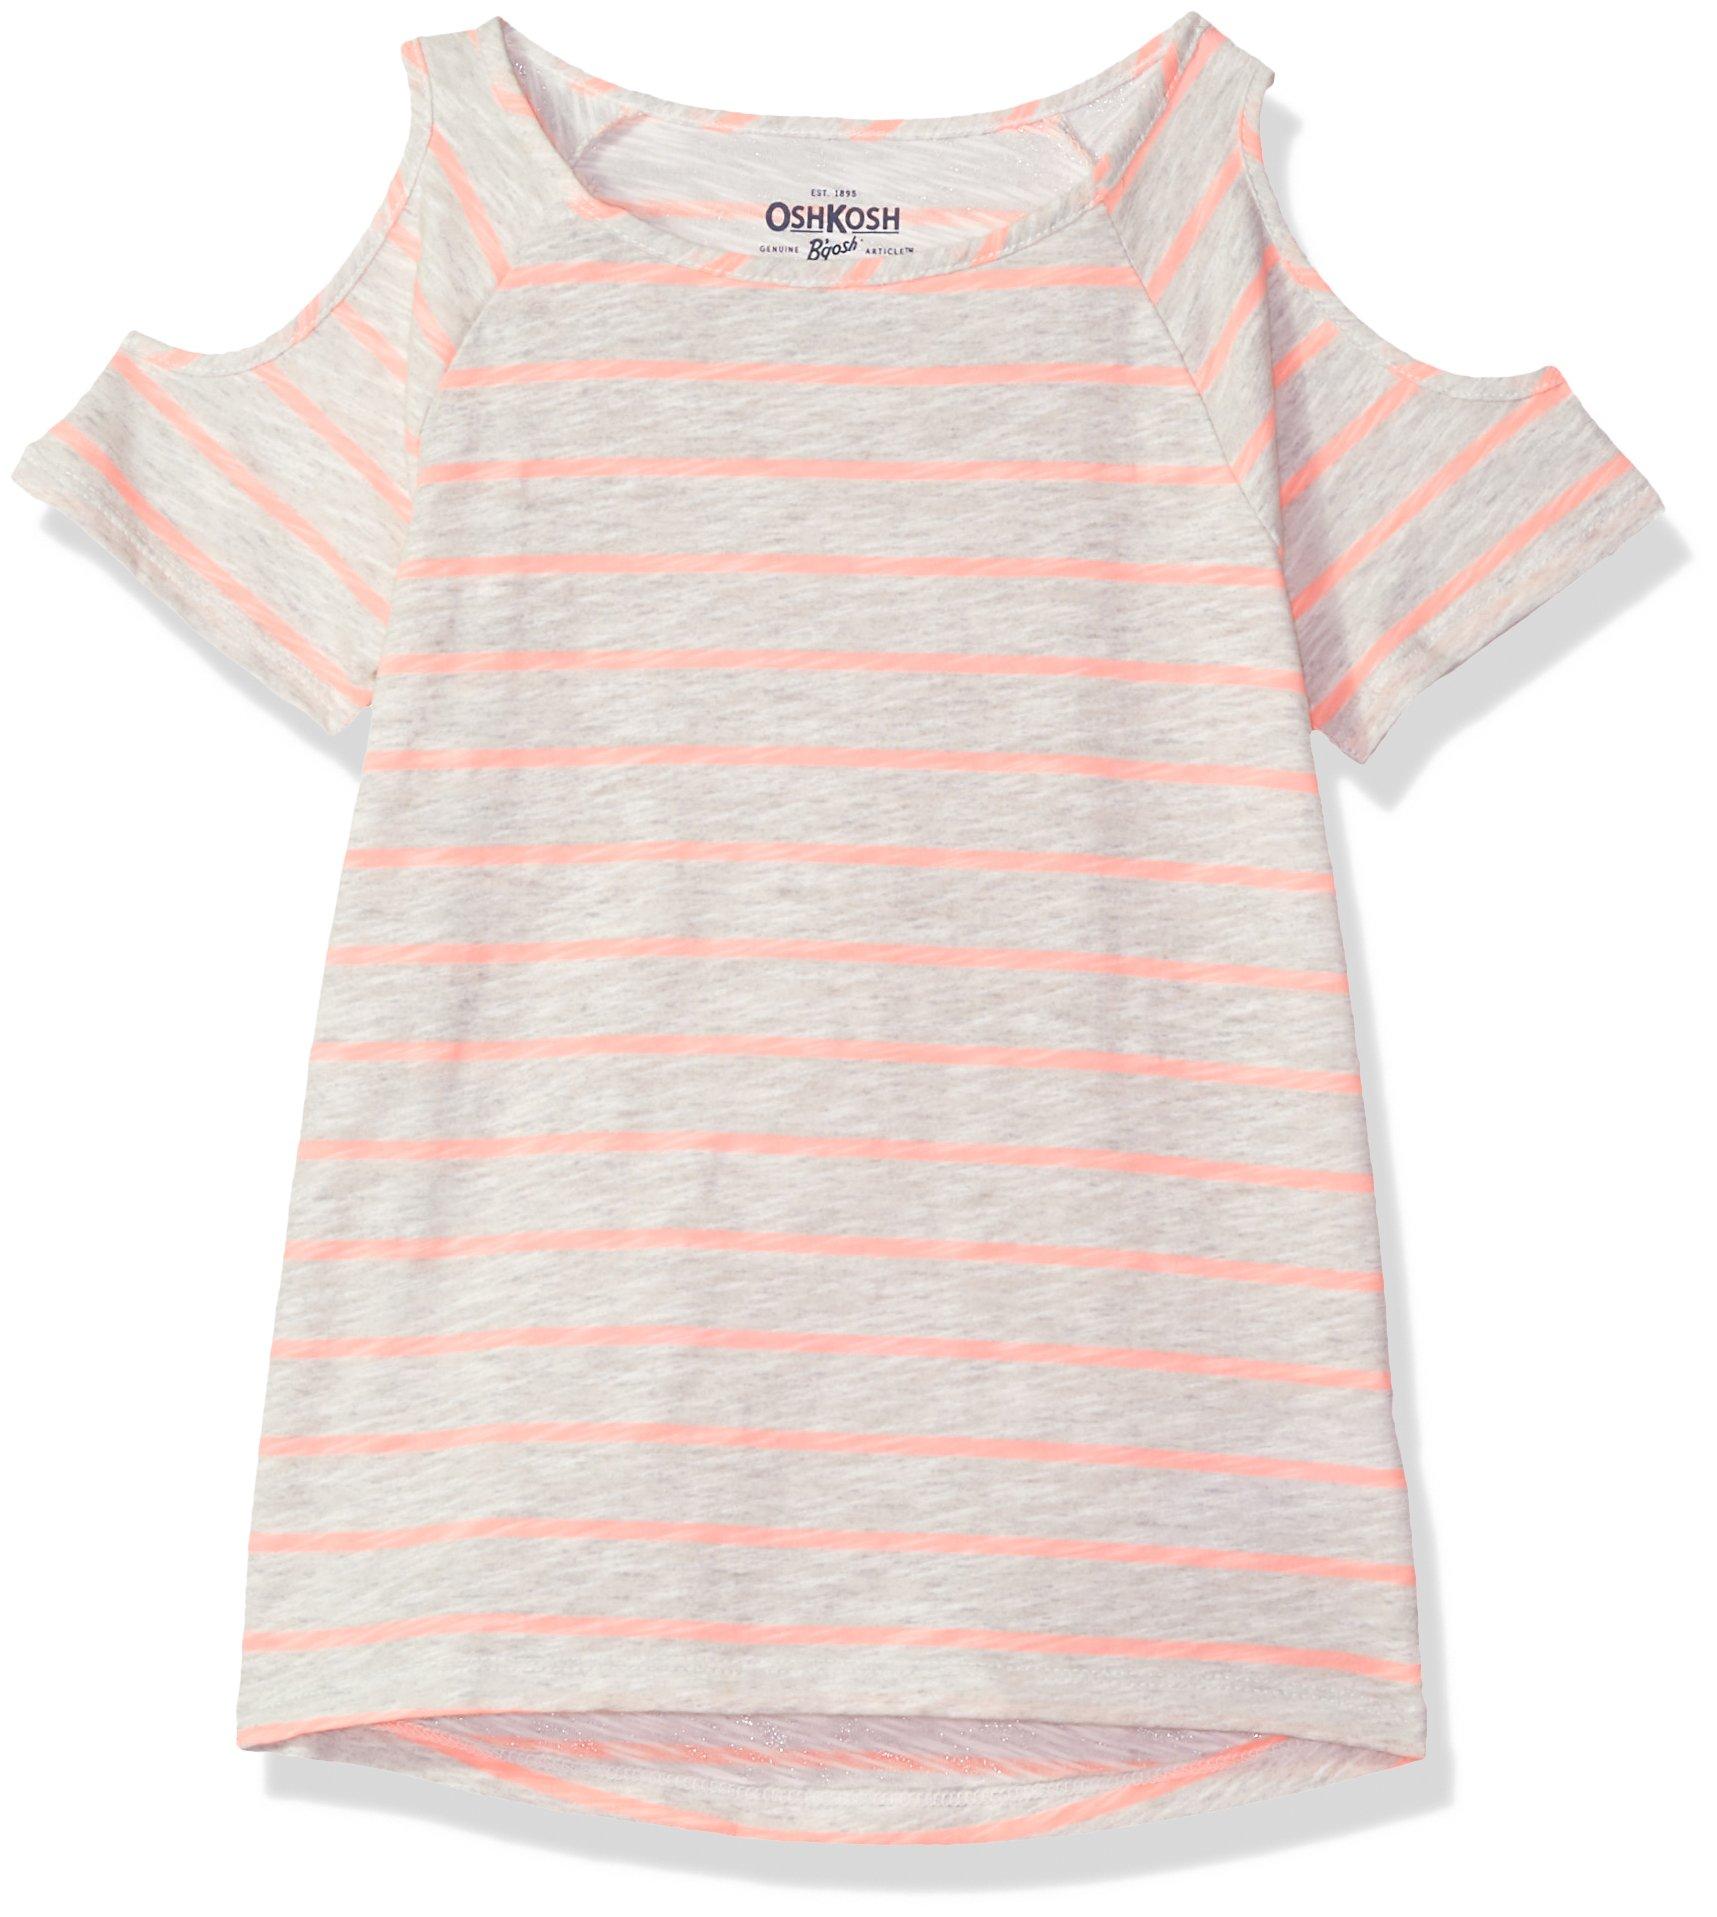 Osh Kosh Girls' Kids Fashion Tops, Coral Stripe, 4-5